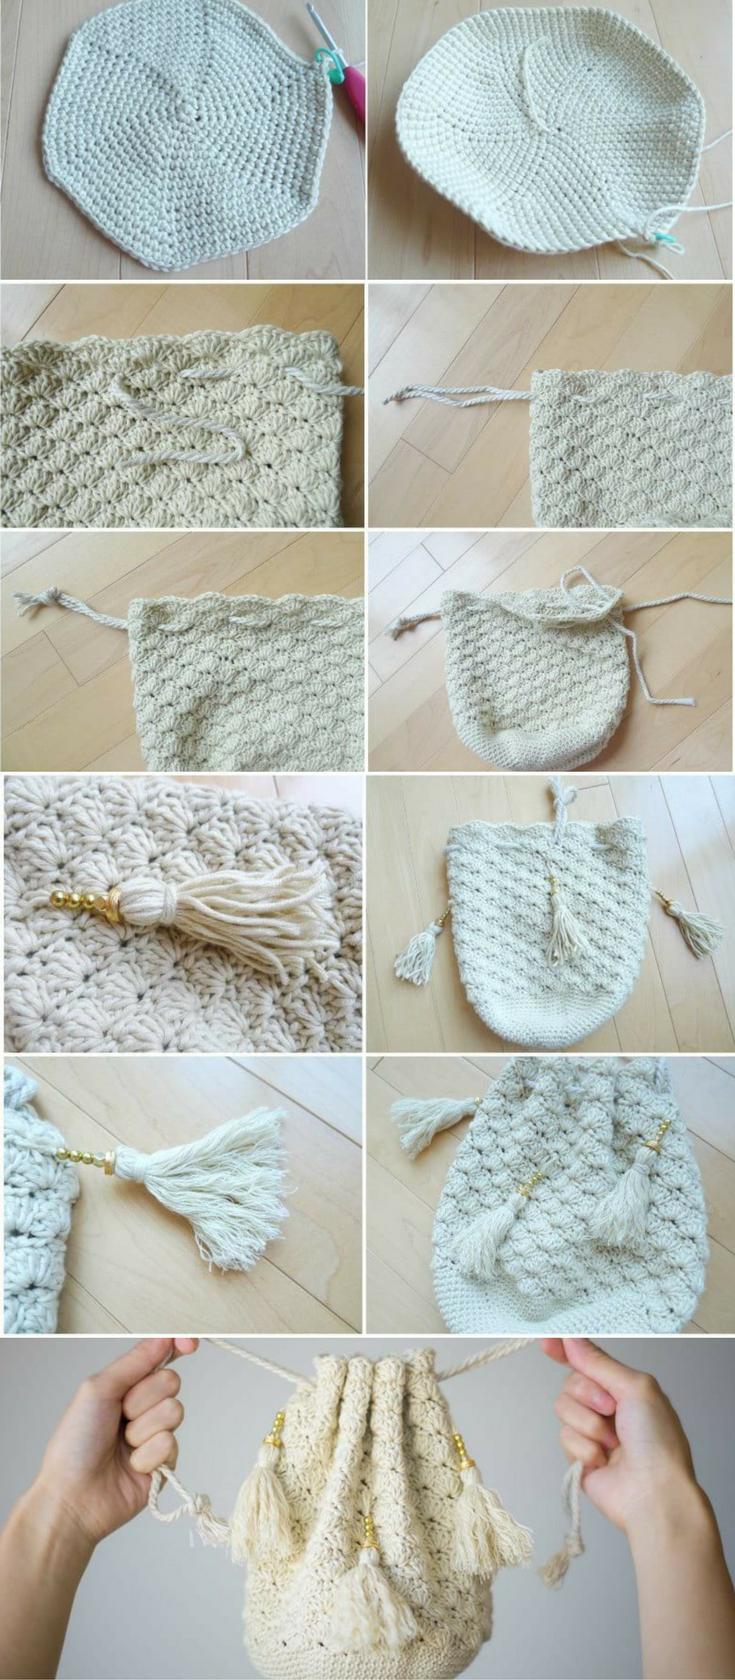 Crochet Regency Reticule - pattern and photo tutorial | Maggie\'s ...